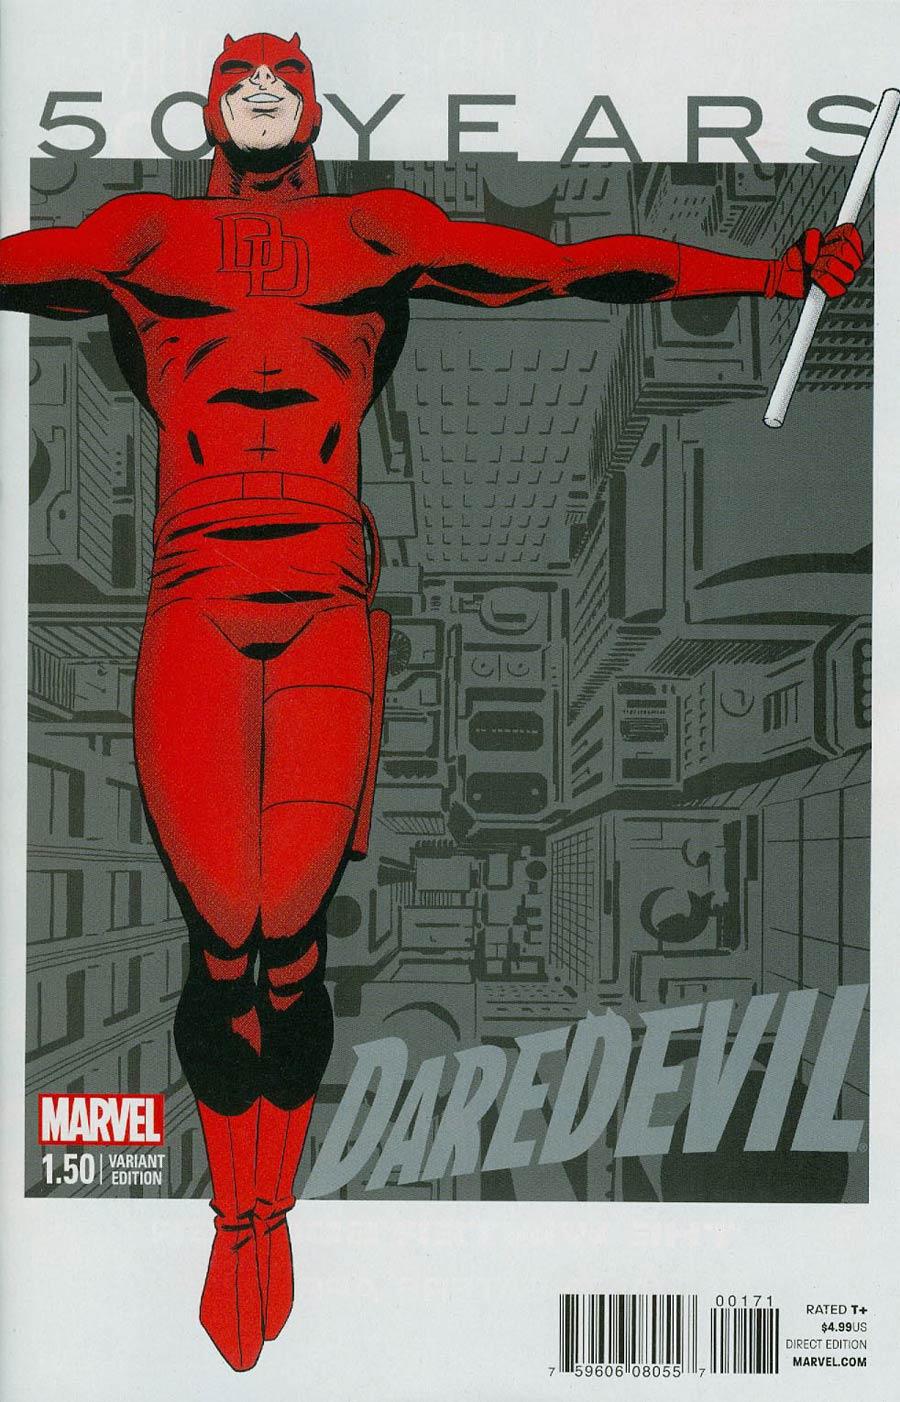 Daredevil Vol 4 #1.50 Cover G Variant Marcos Martin 2000s Gray Cover